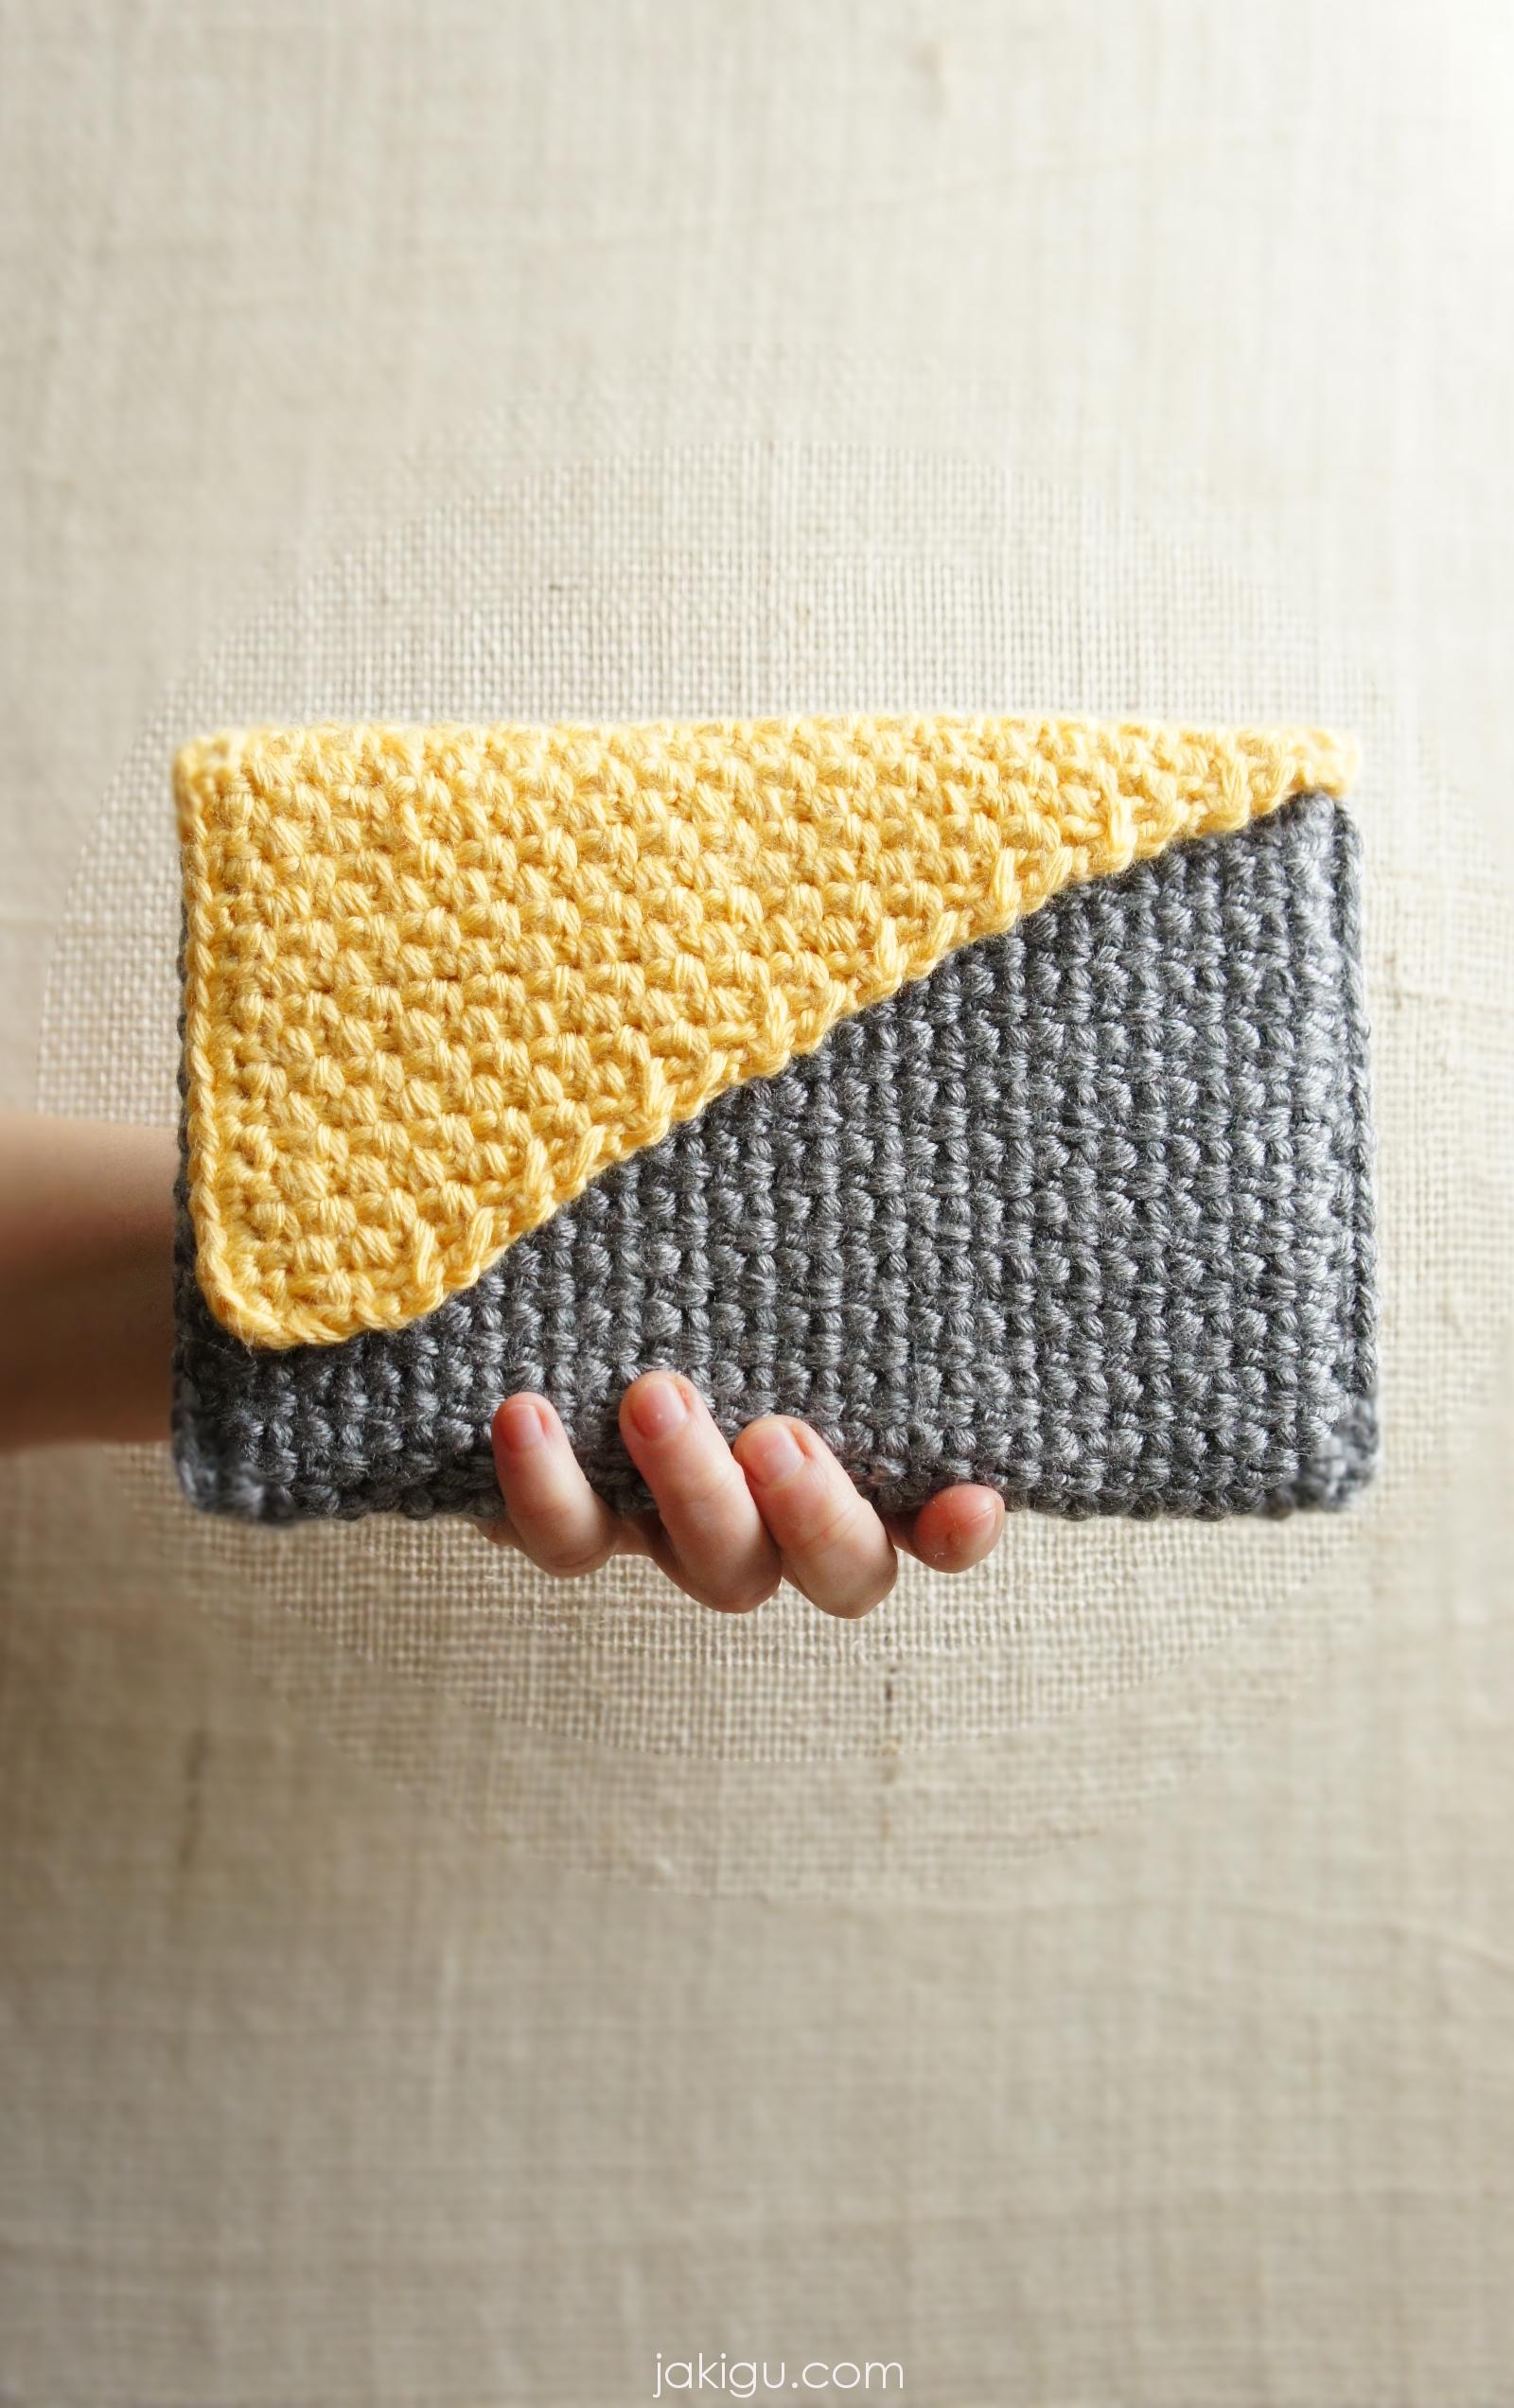 Free Crochet Book Cover Patterns ~ Crochet handbag crochet pattern preview by jakigu